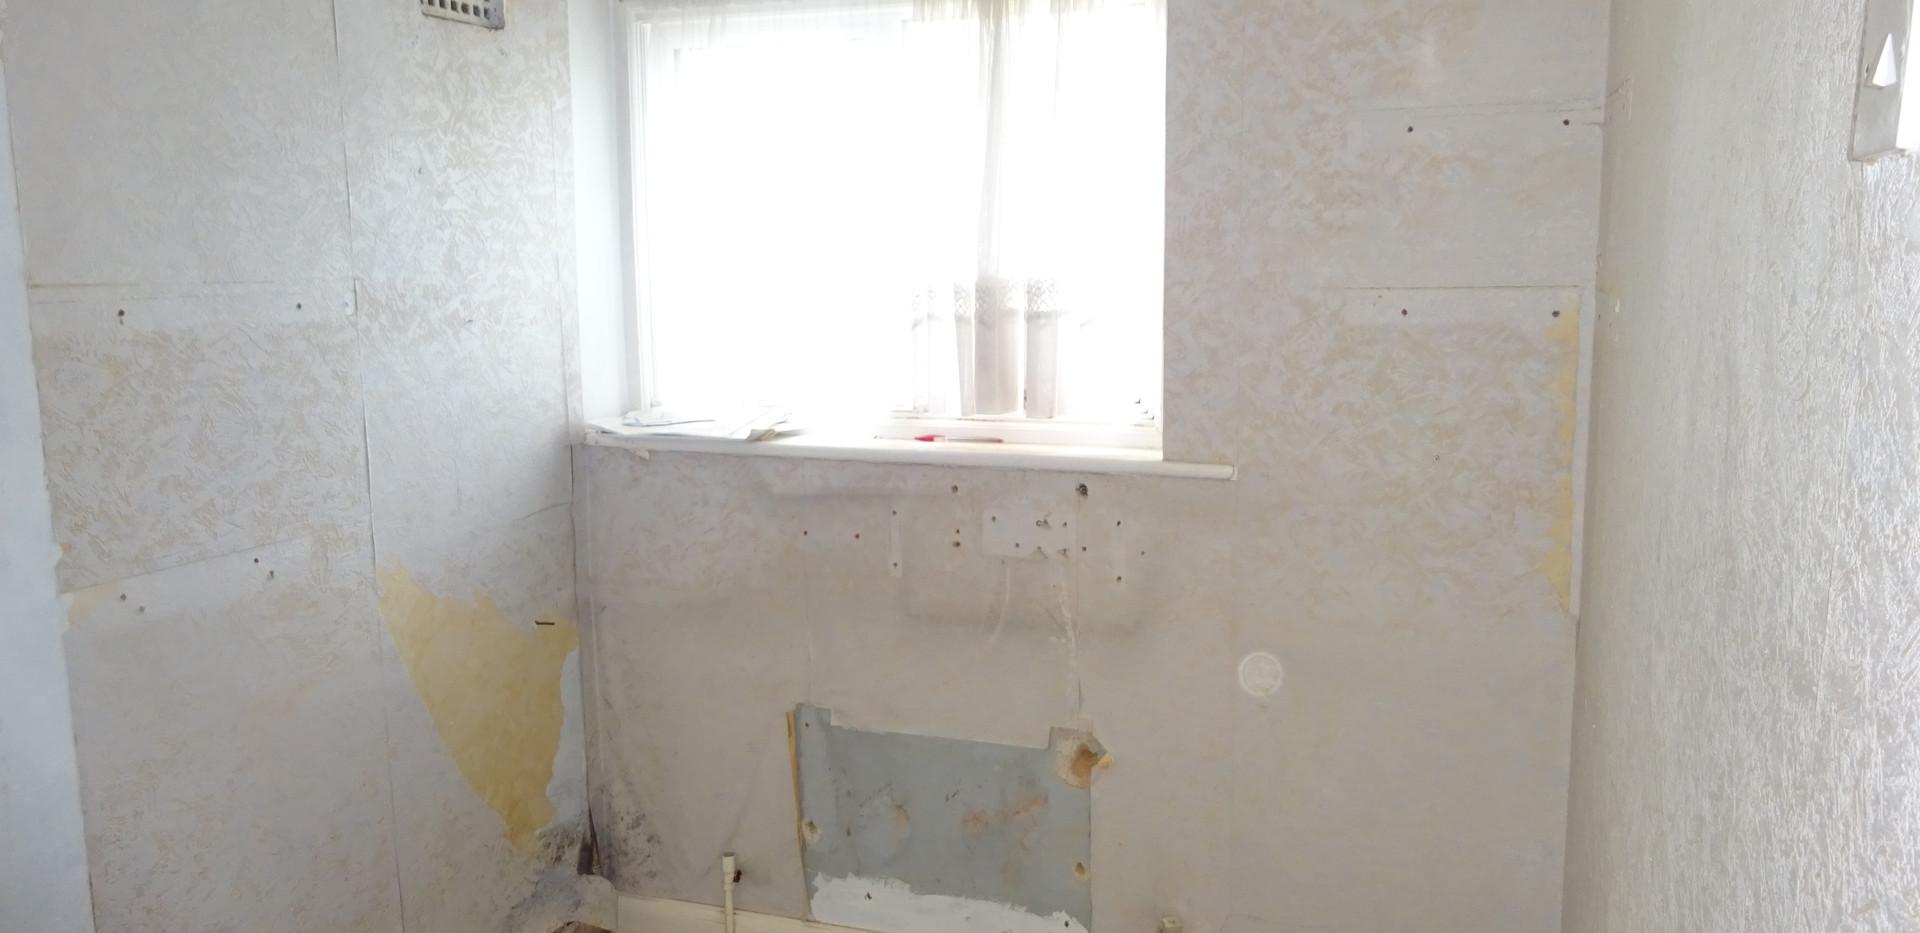 Bedroom (Before)